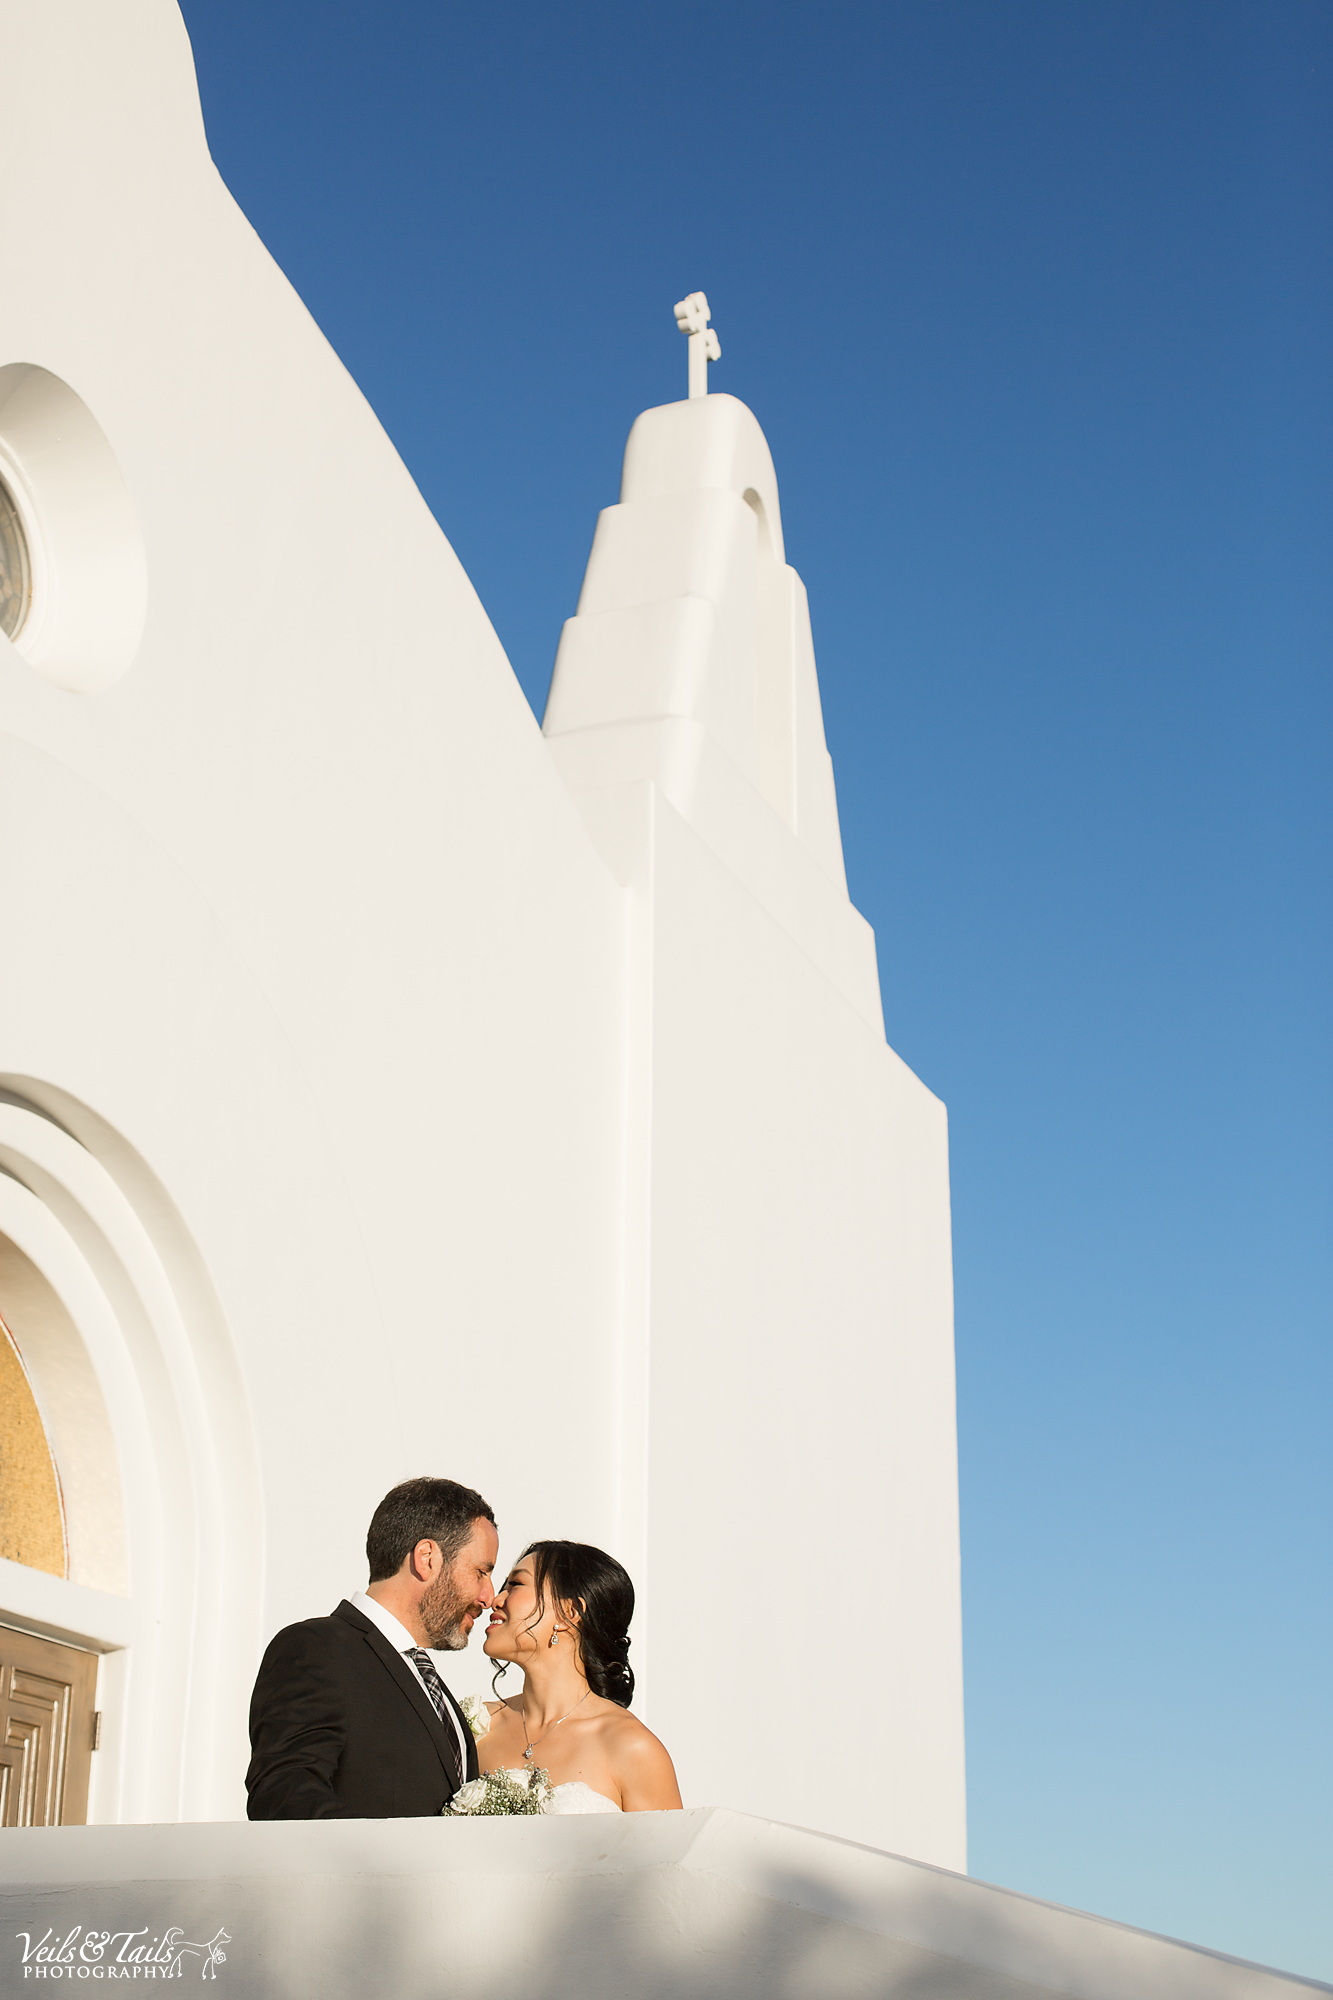 Weddings & Engagements Photographer Santa Barbara